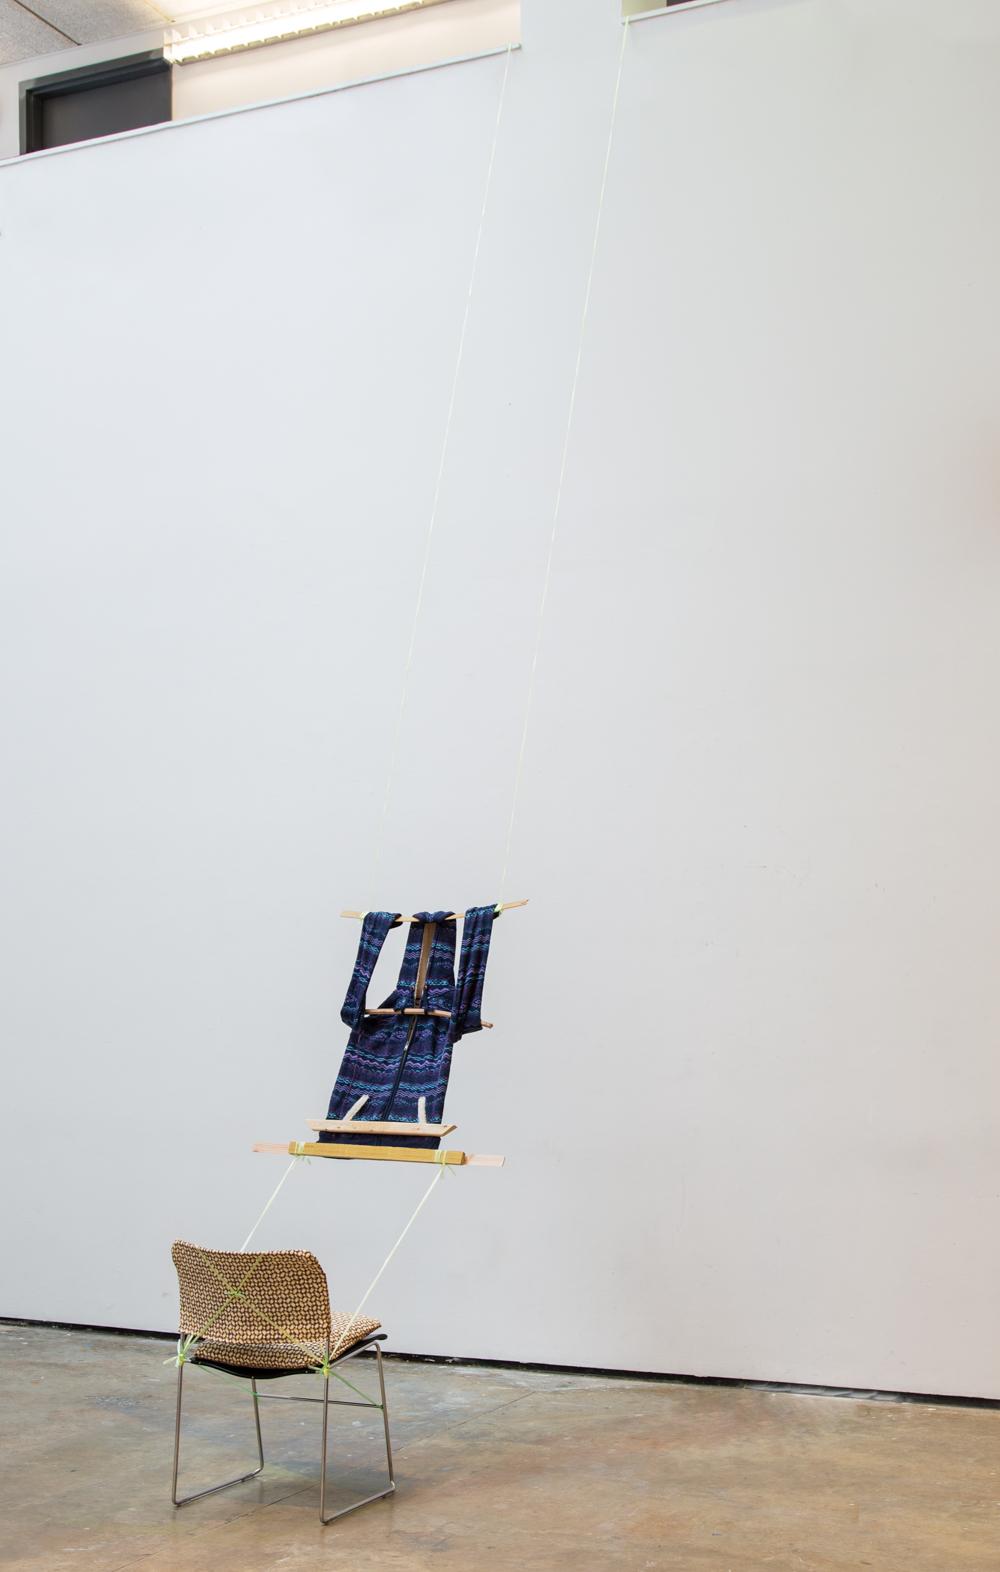 Loom, 2014, hoodie, plastic chord, wood, custom Banig-print fabric chair covering, Yale critique chair, 240 x 20 x 20 inches